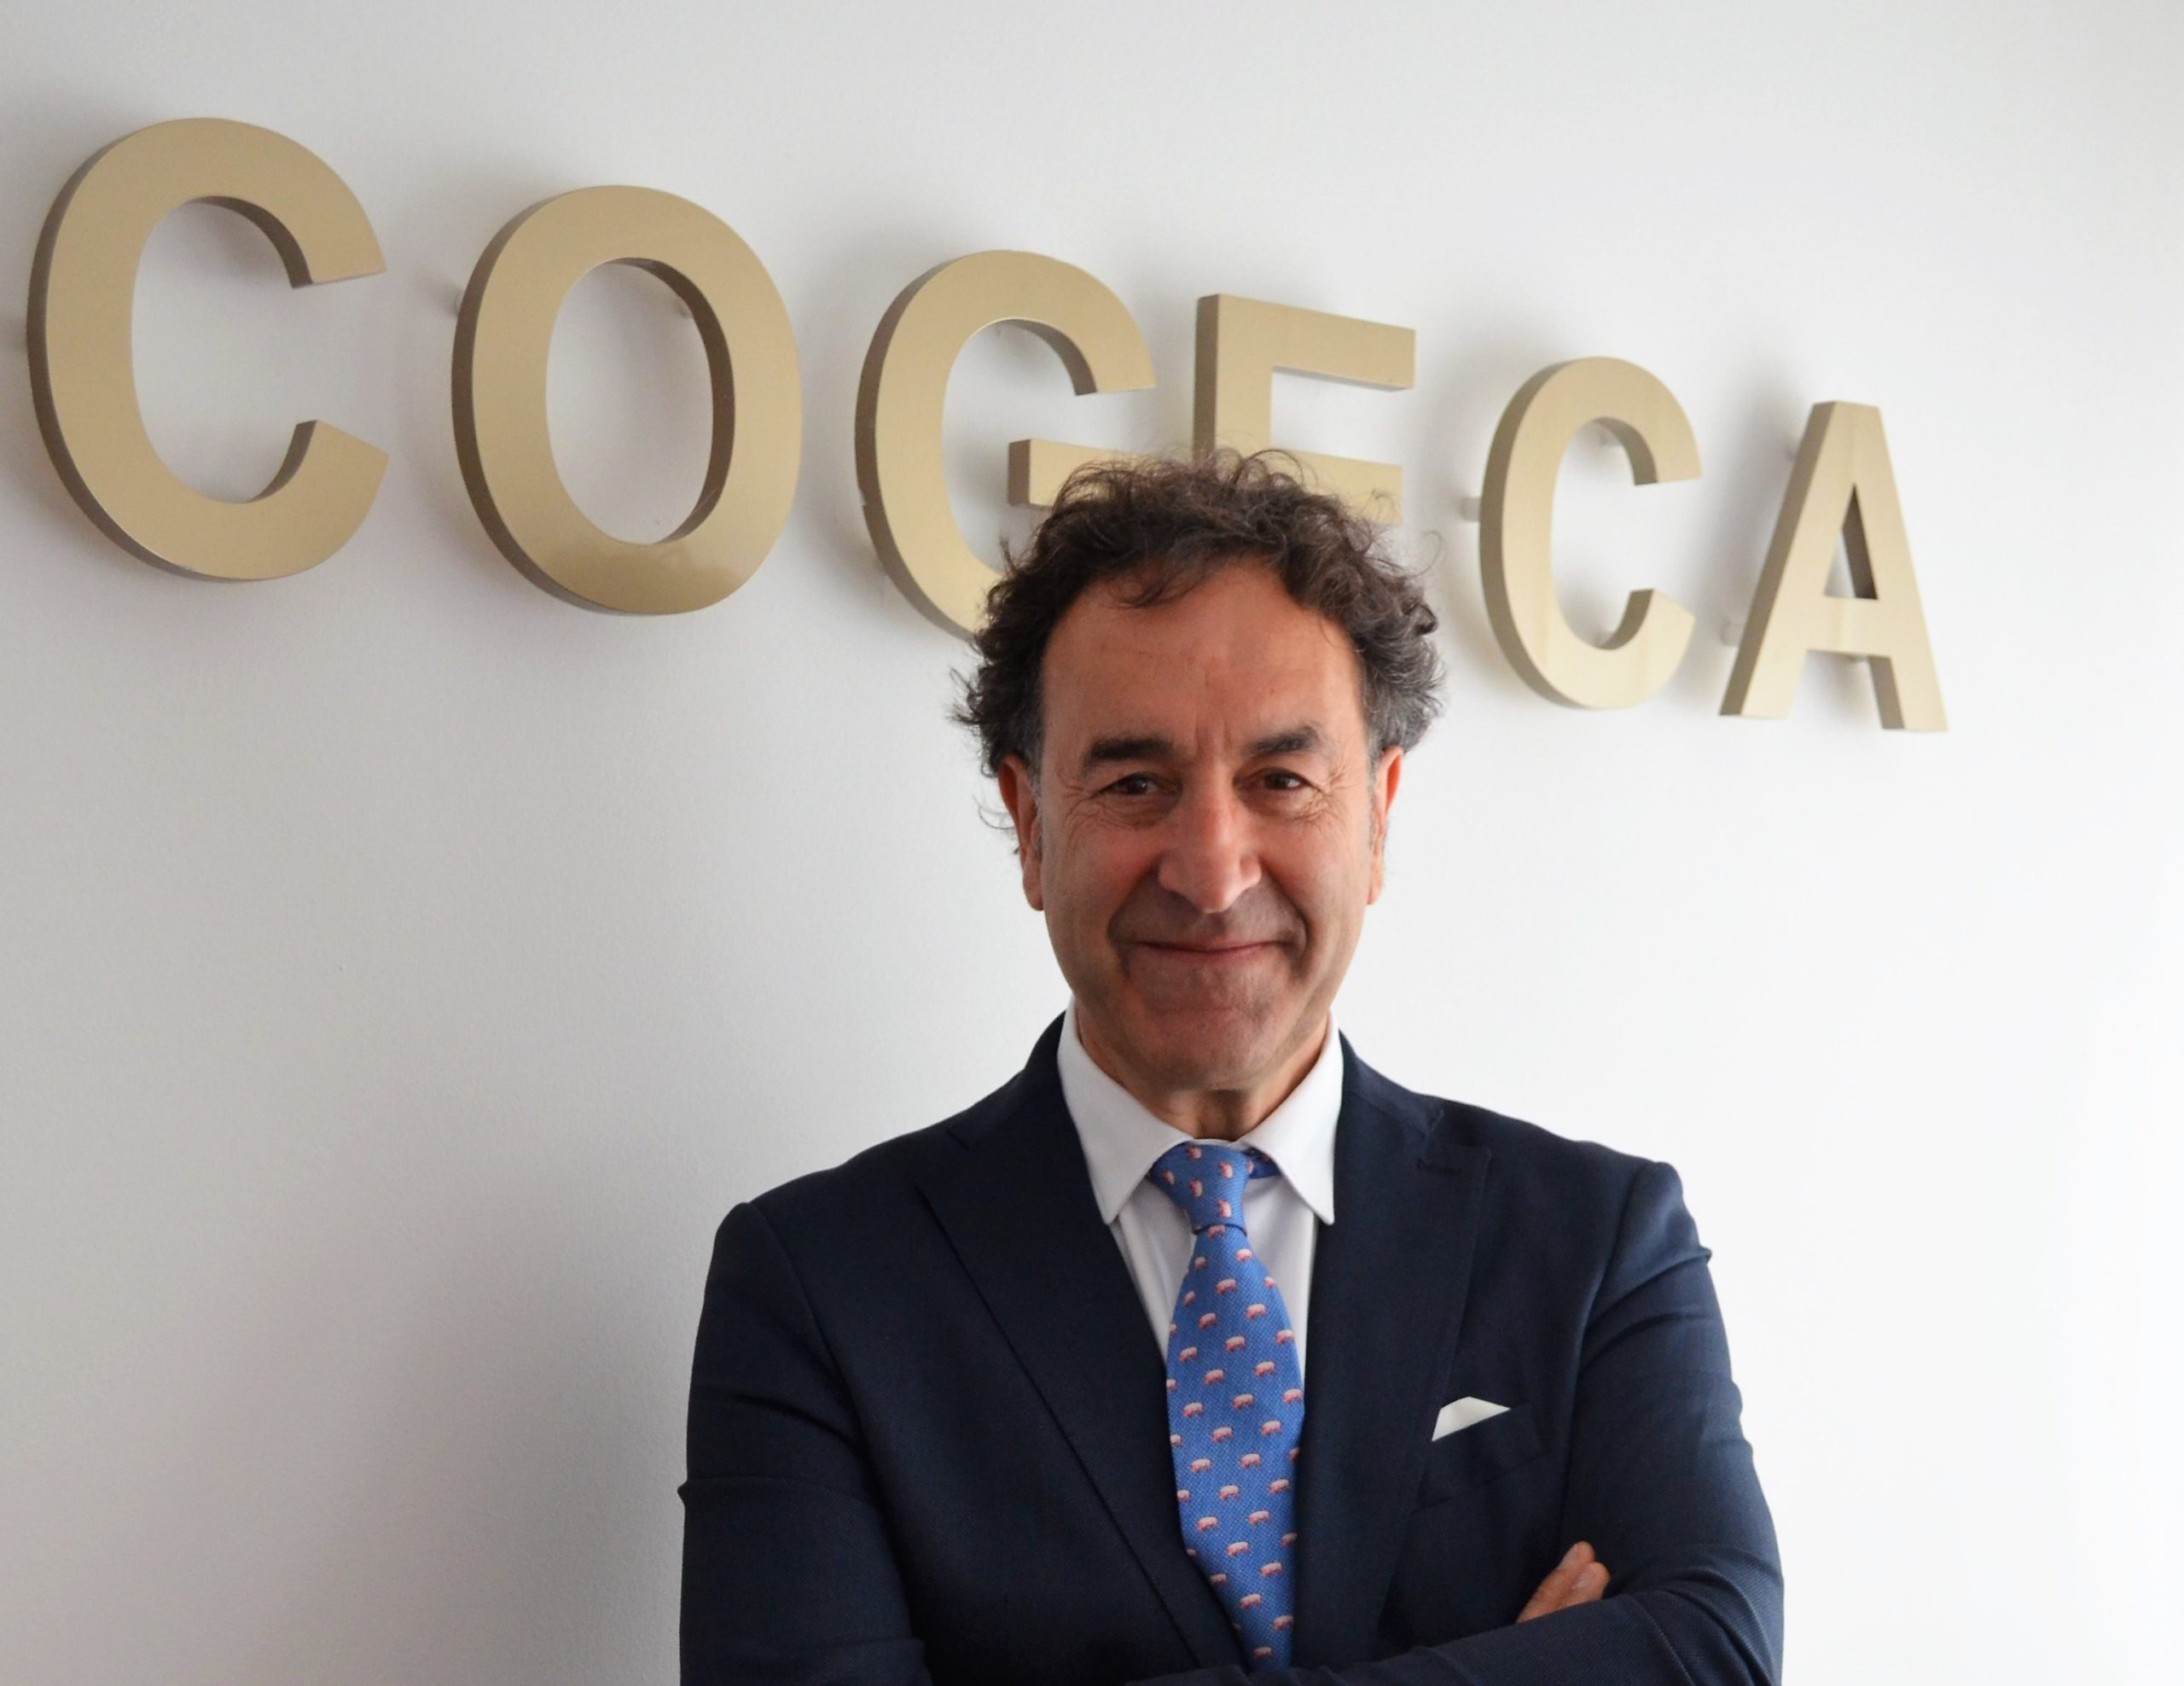 NUOVO PRESIDENTE DEL COPA COGECA